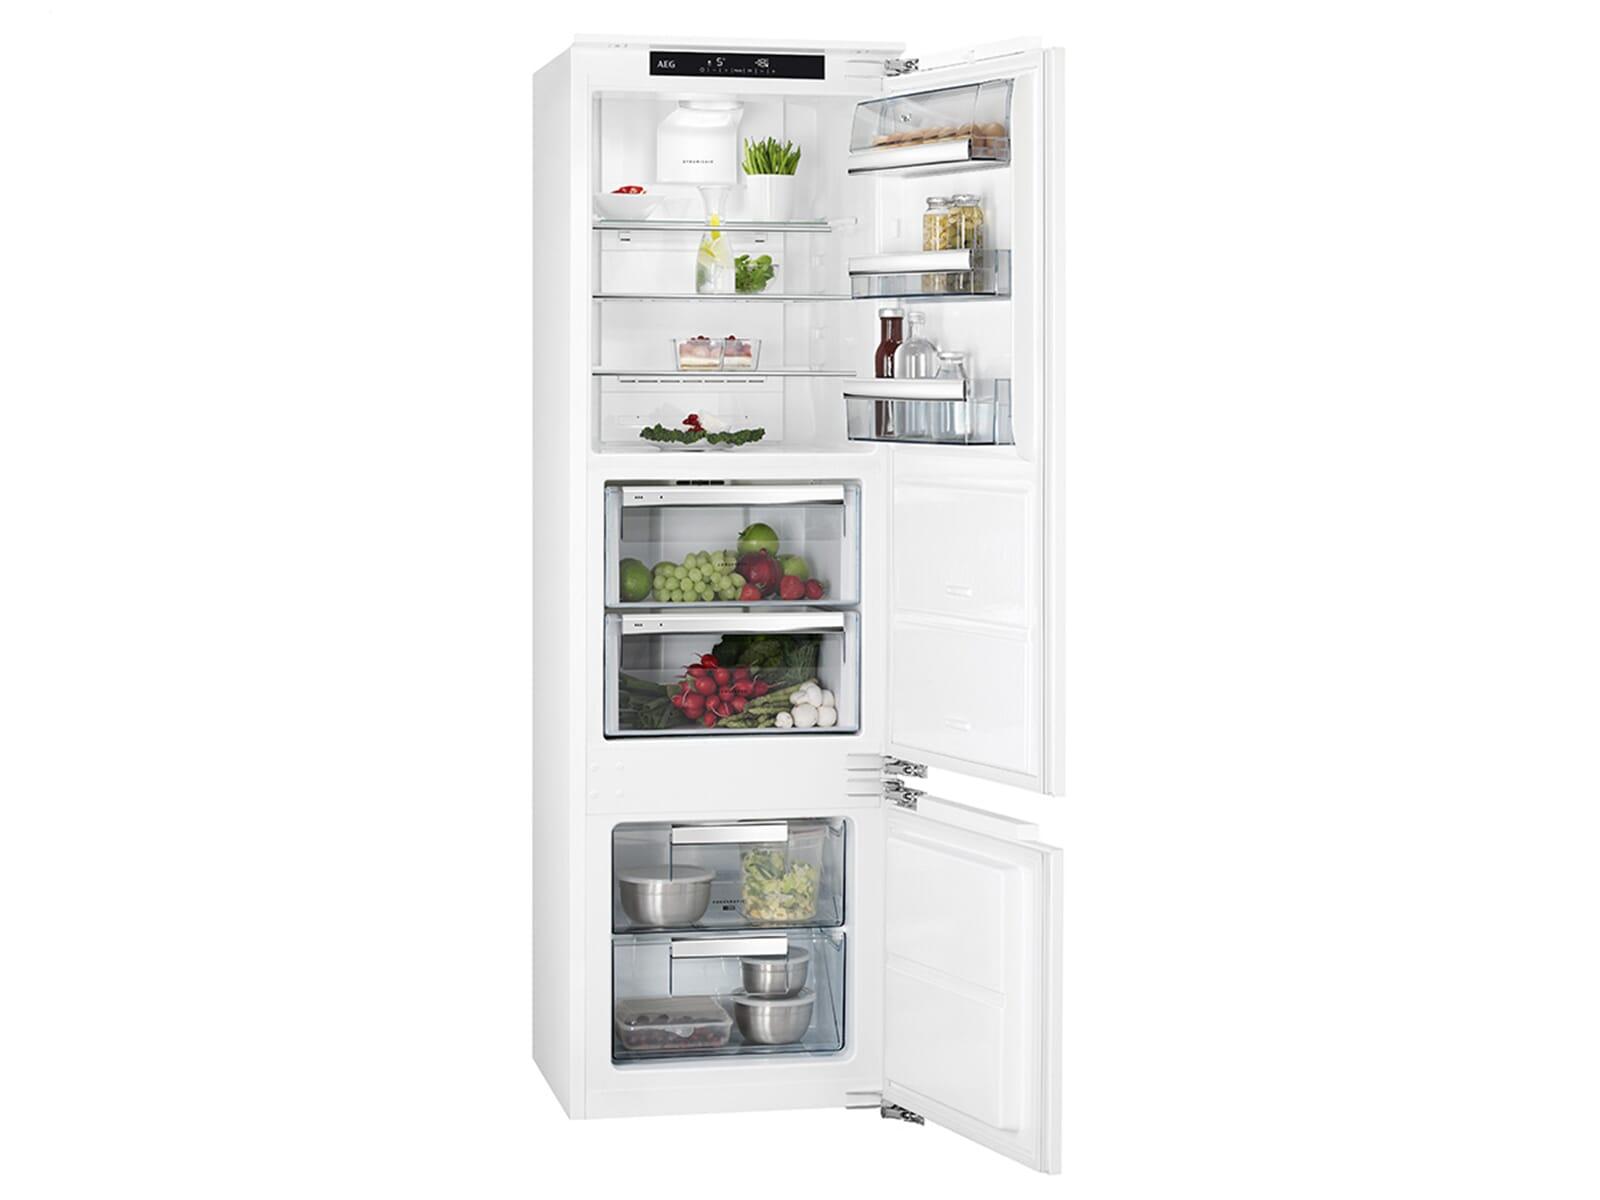 Retro Kühlschrank Pelgrim : Kombi kühlschrank smeg rf376lsix preisvergleich kühl gefrier kombi